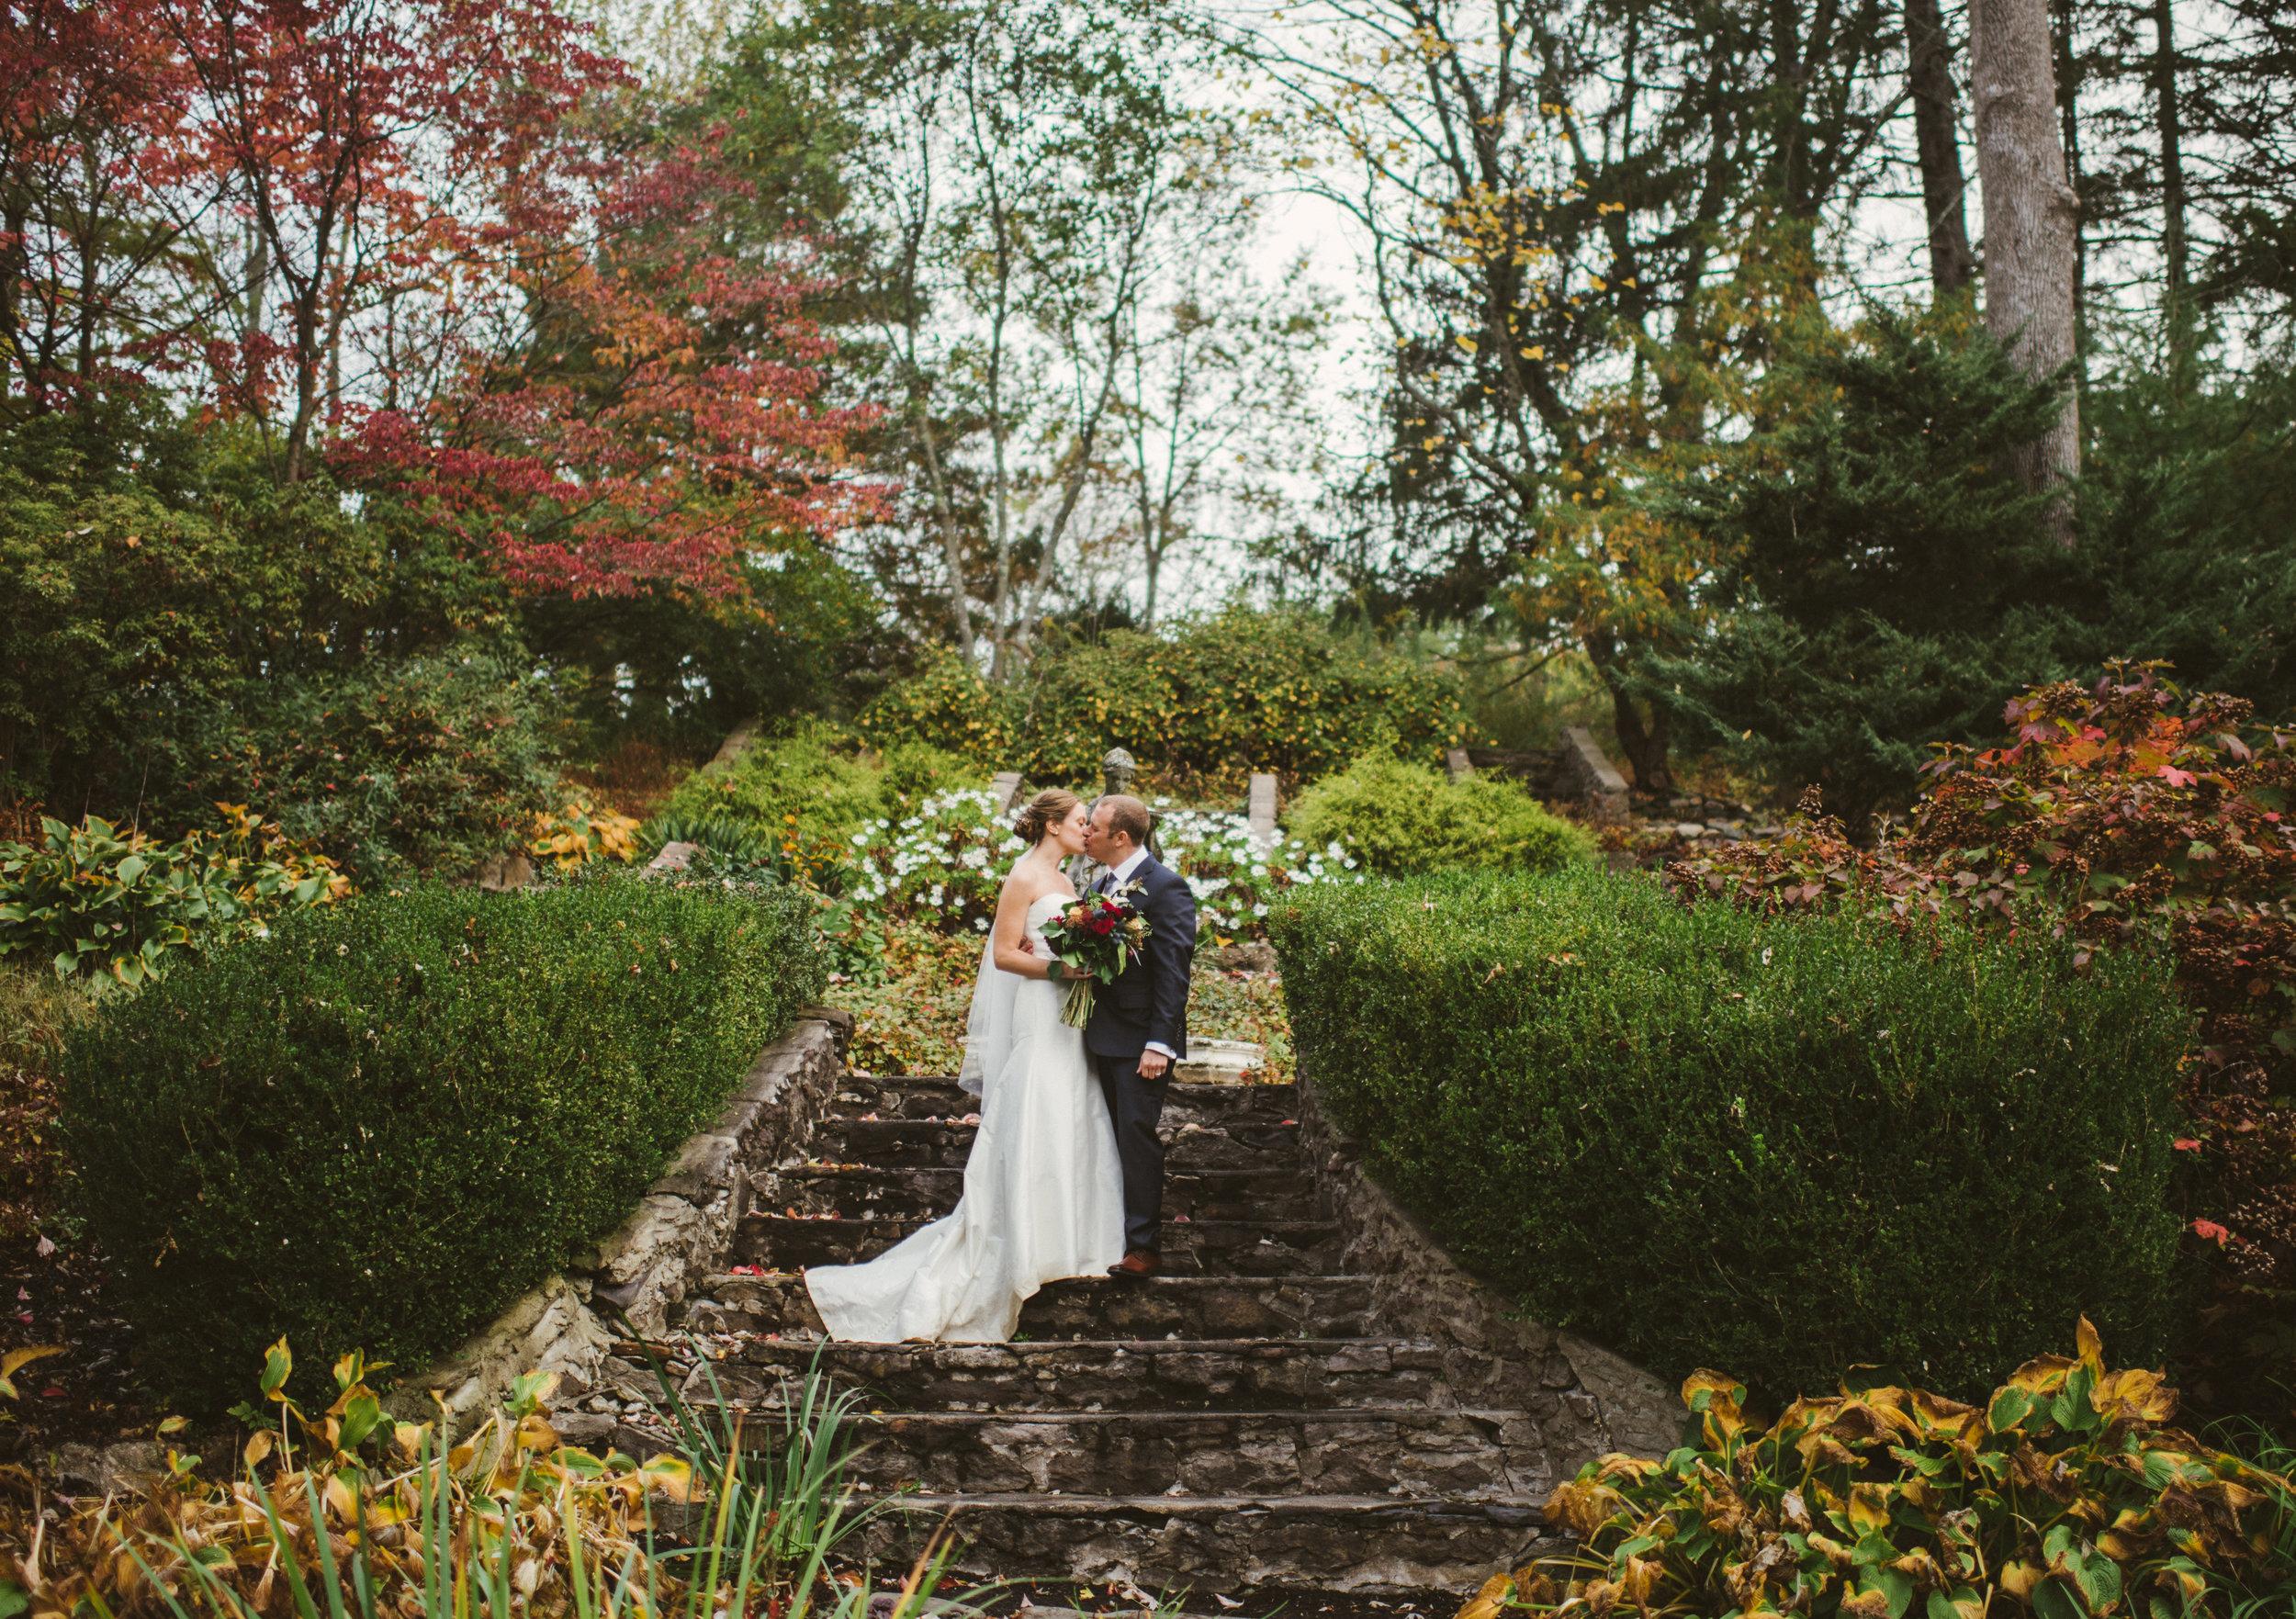 JACQUELINE & ANDREW WARSHAWER -BROOKMILL FARM FALL WEDDING - INTIMATE WEDDING PHOTOGRAPHER - TWOTWENTY by CHI-CHI AGBIM-420.jpg